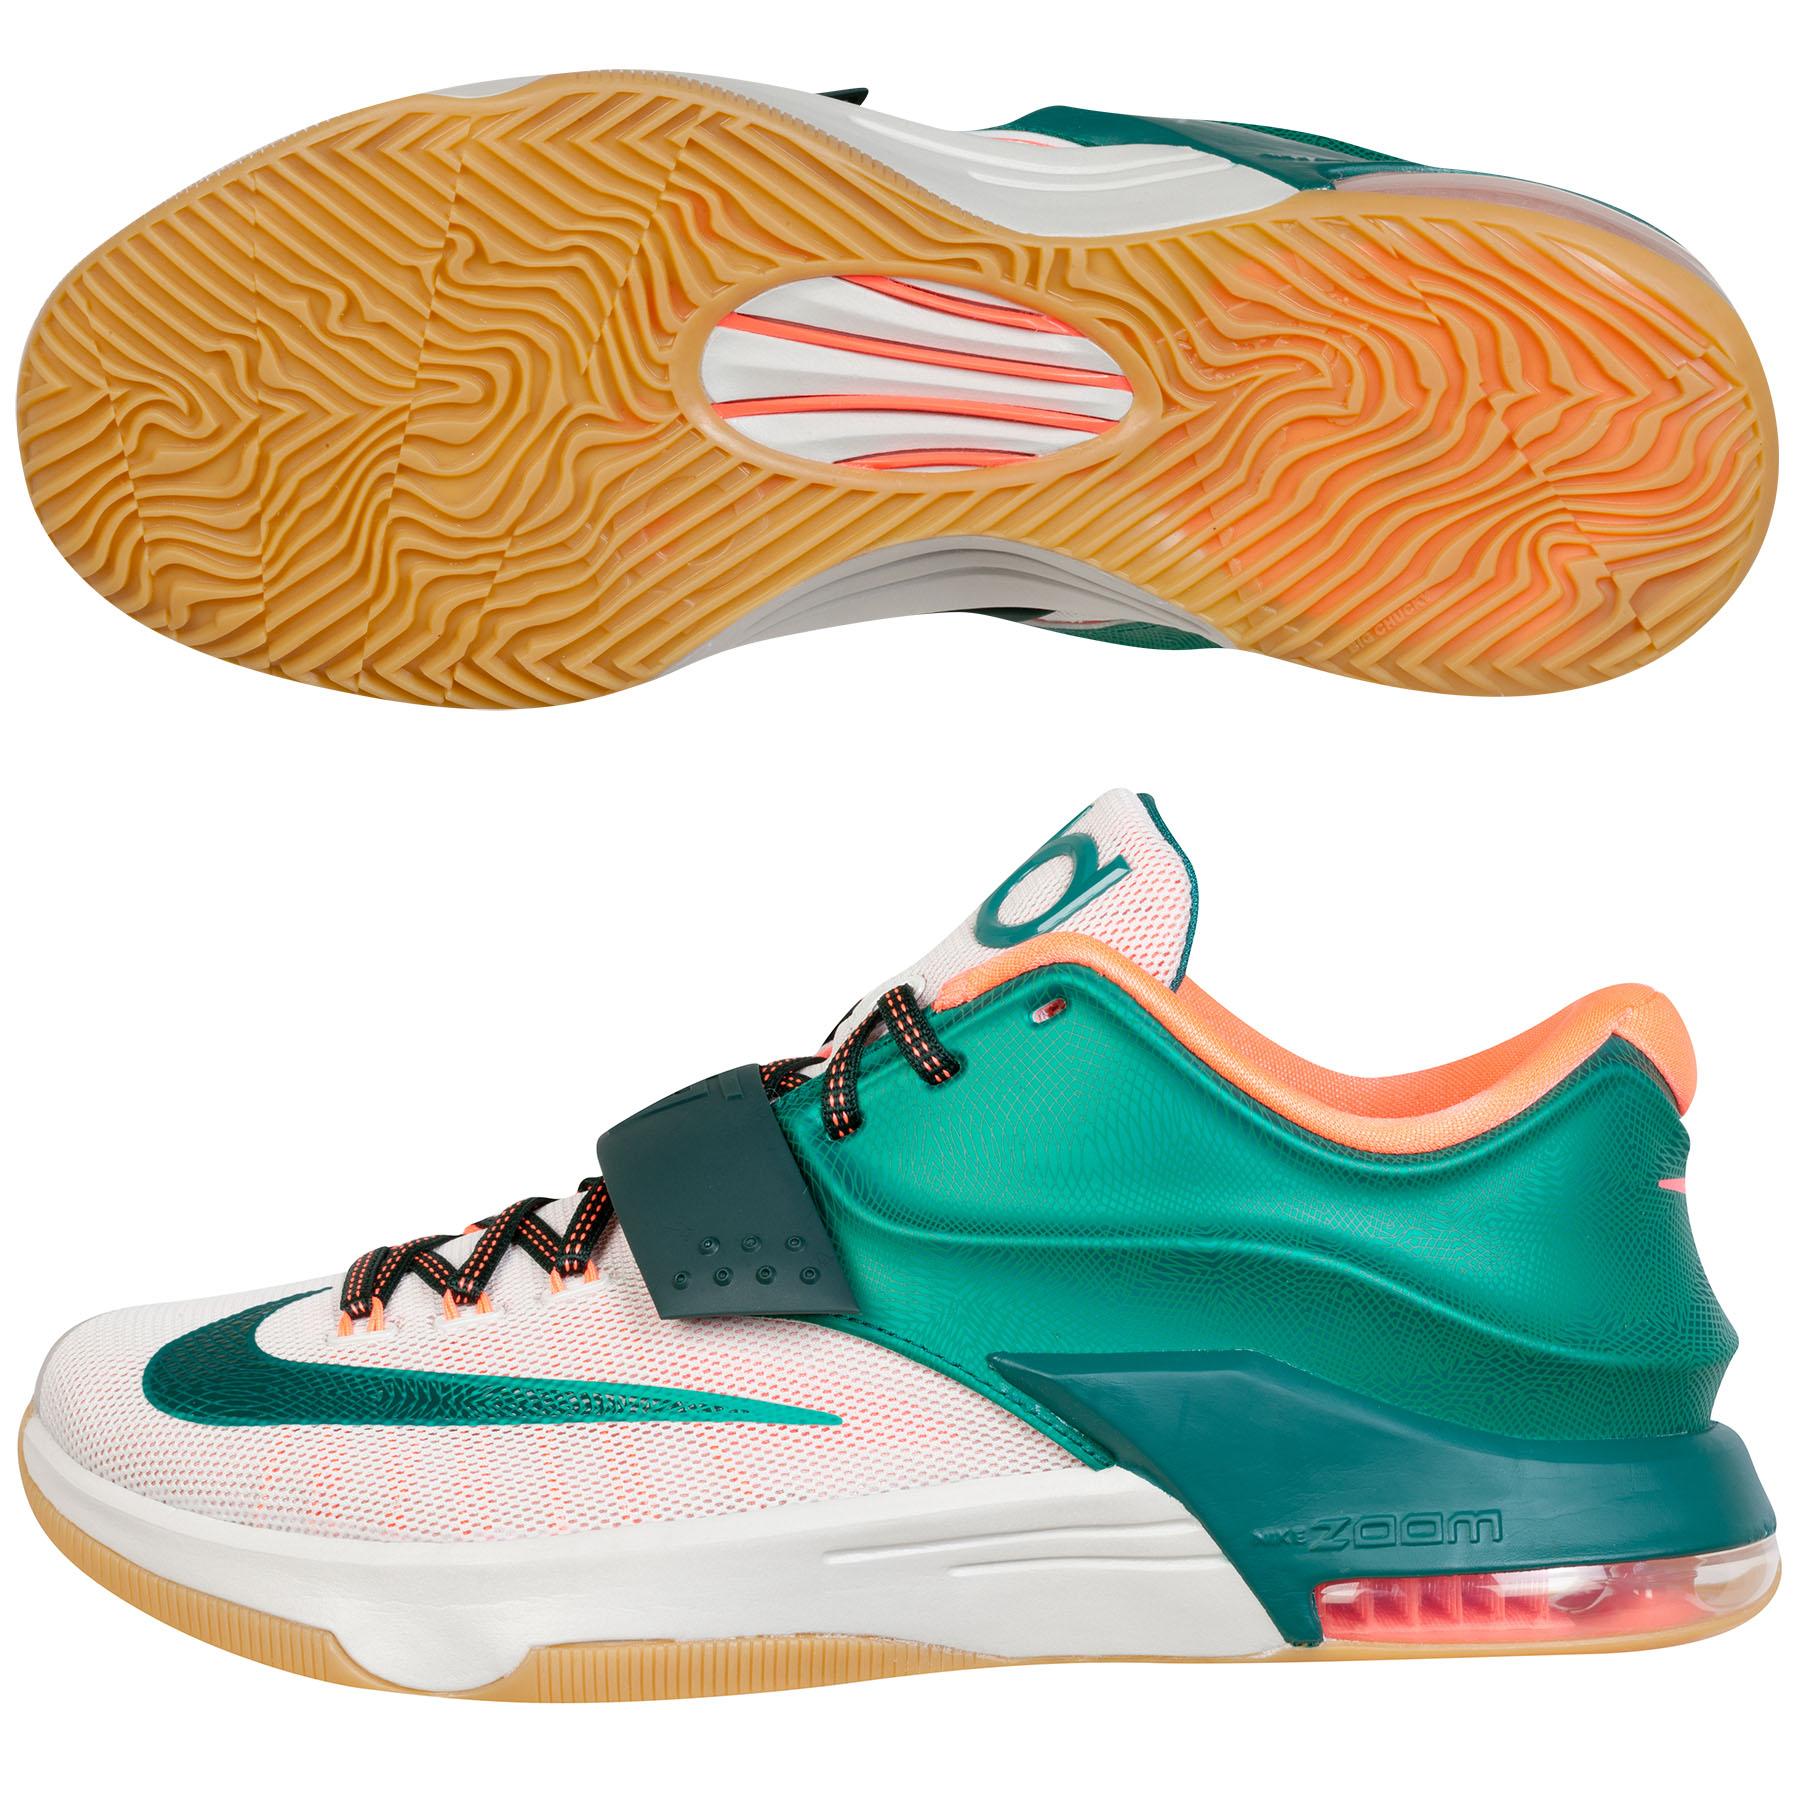 Nike KD VII Basketball Shoe - Mystic Green